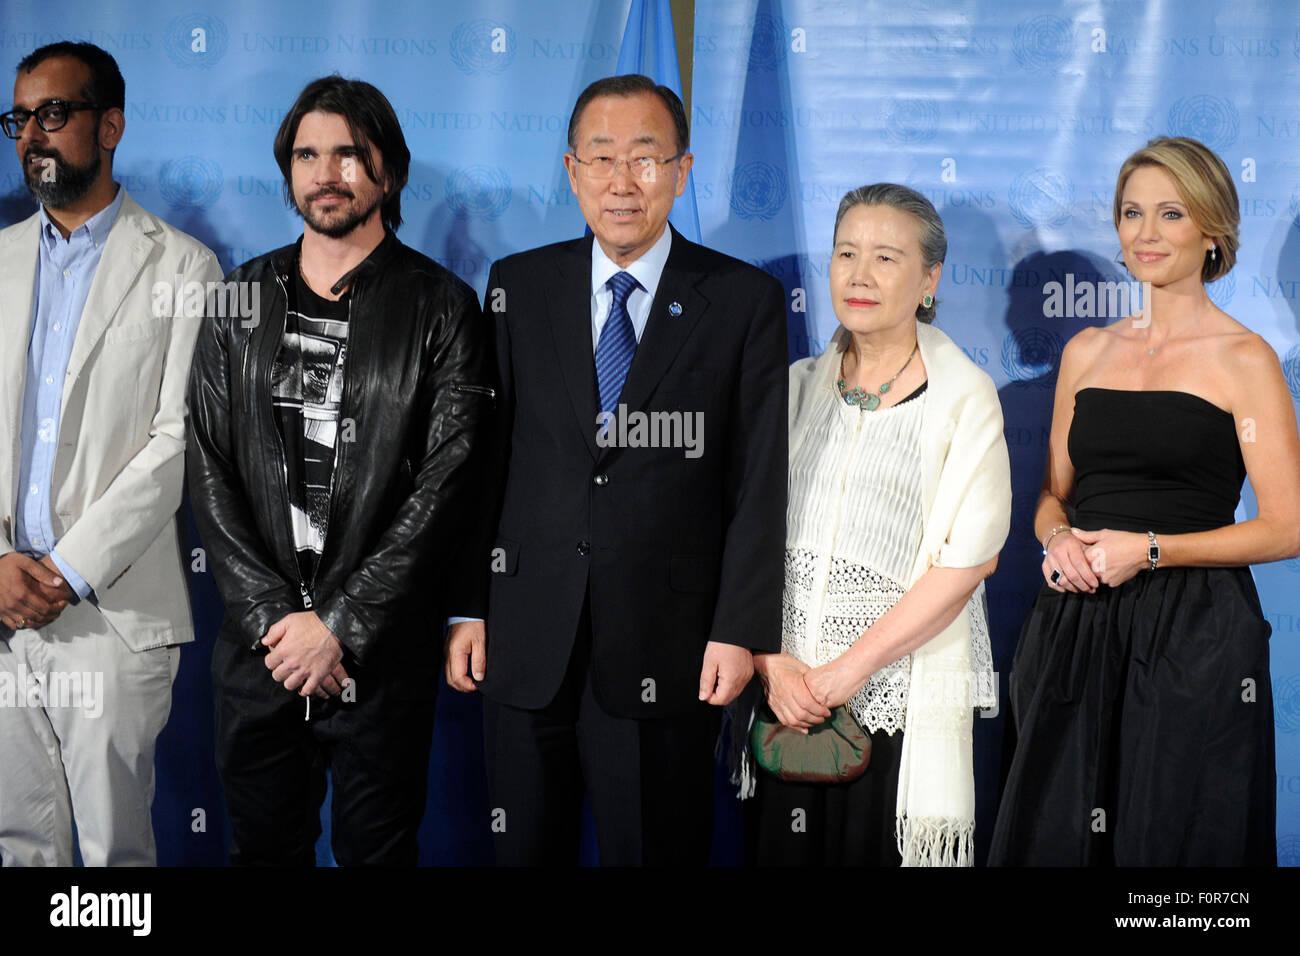 VICE media founder Suroosh Alvi, singer Juanes, United Nations Secretary-General Ban Ki-moon and his wife Yoo Soon Stock Photo